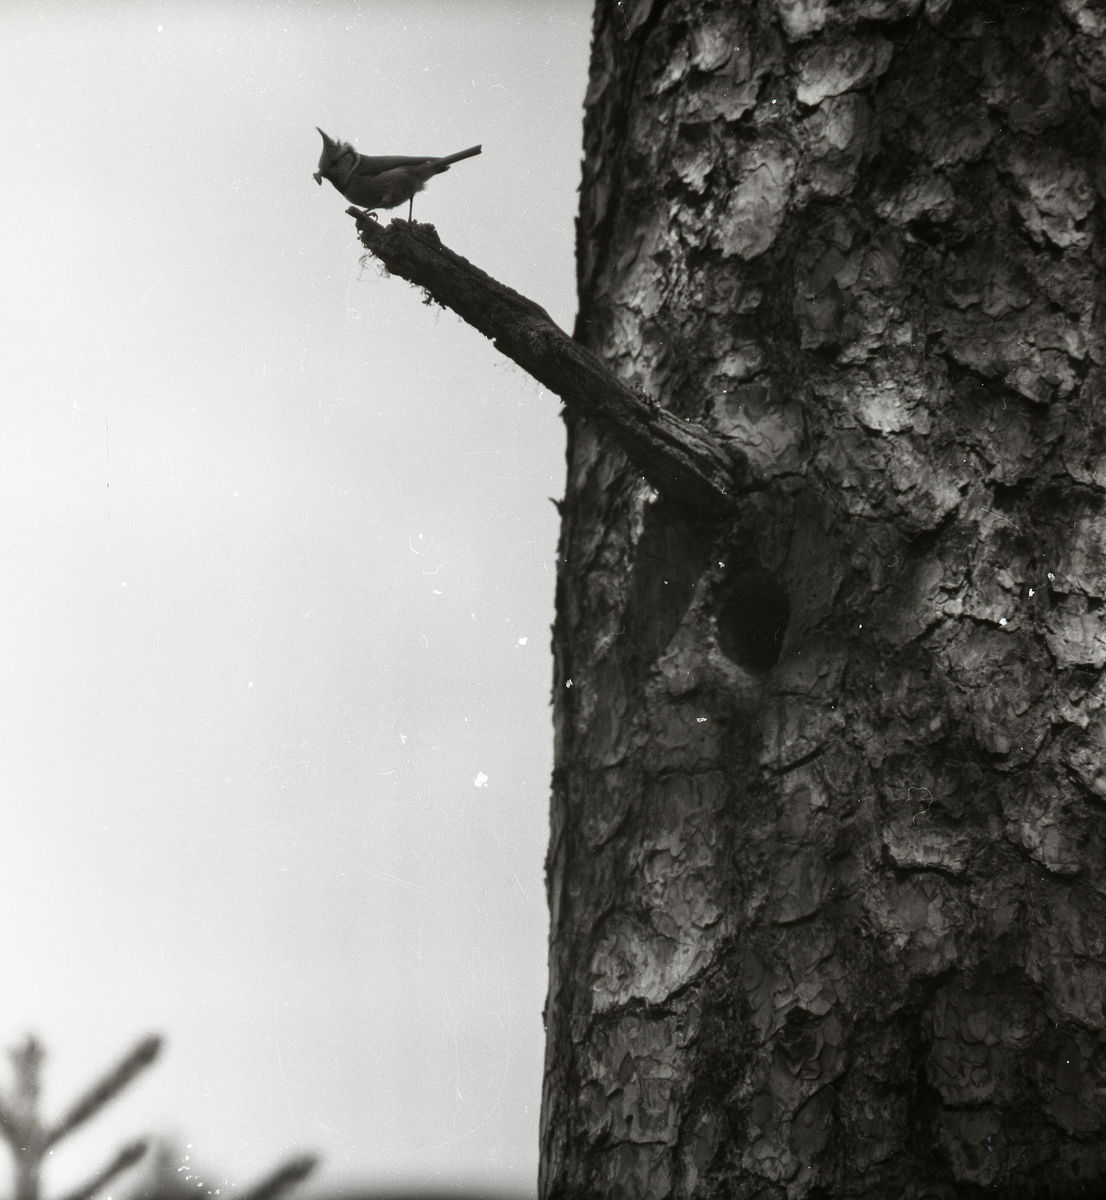 En tofsmes sitter på en gren vid Storsjön i Rengsjö den 1 juni 1957.